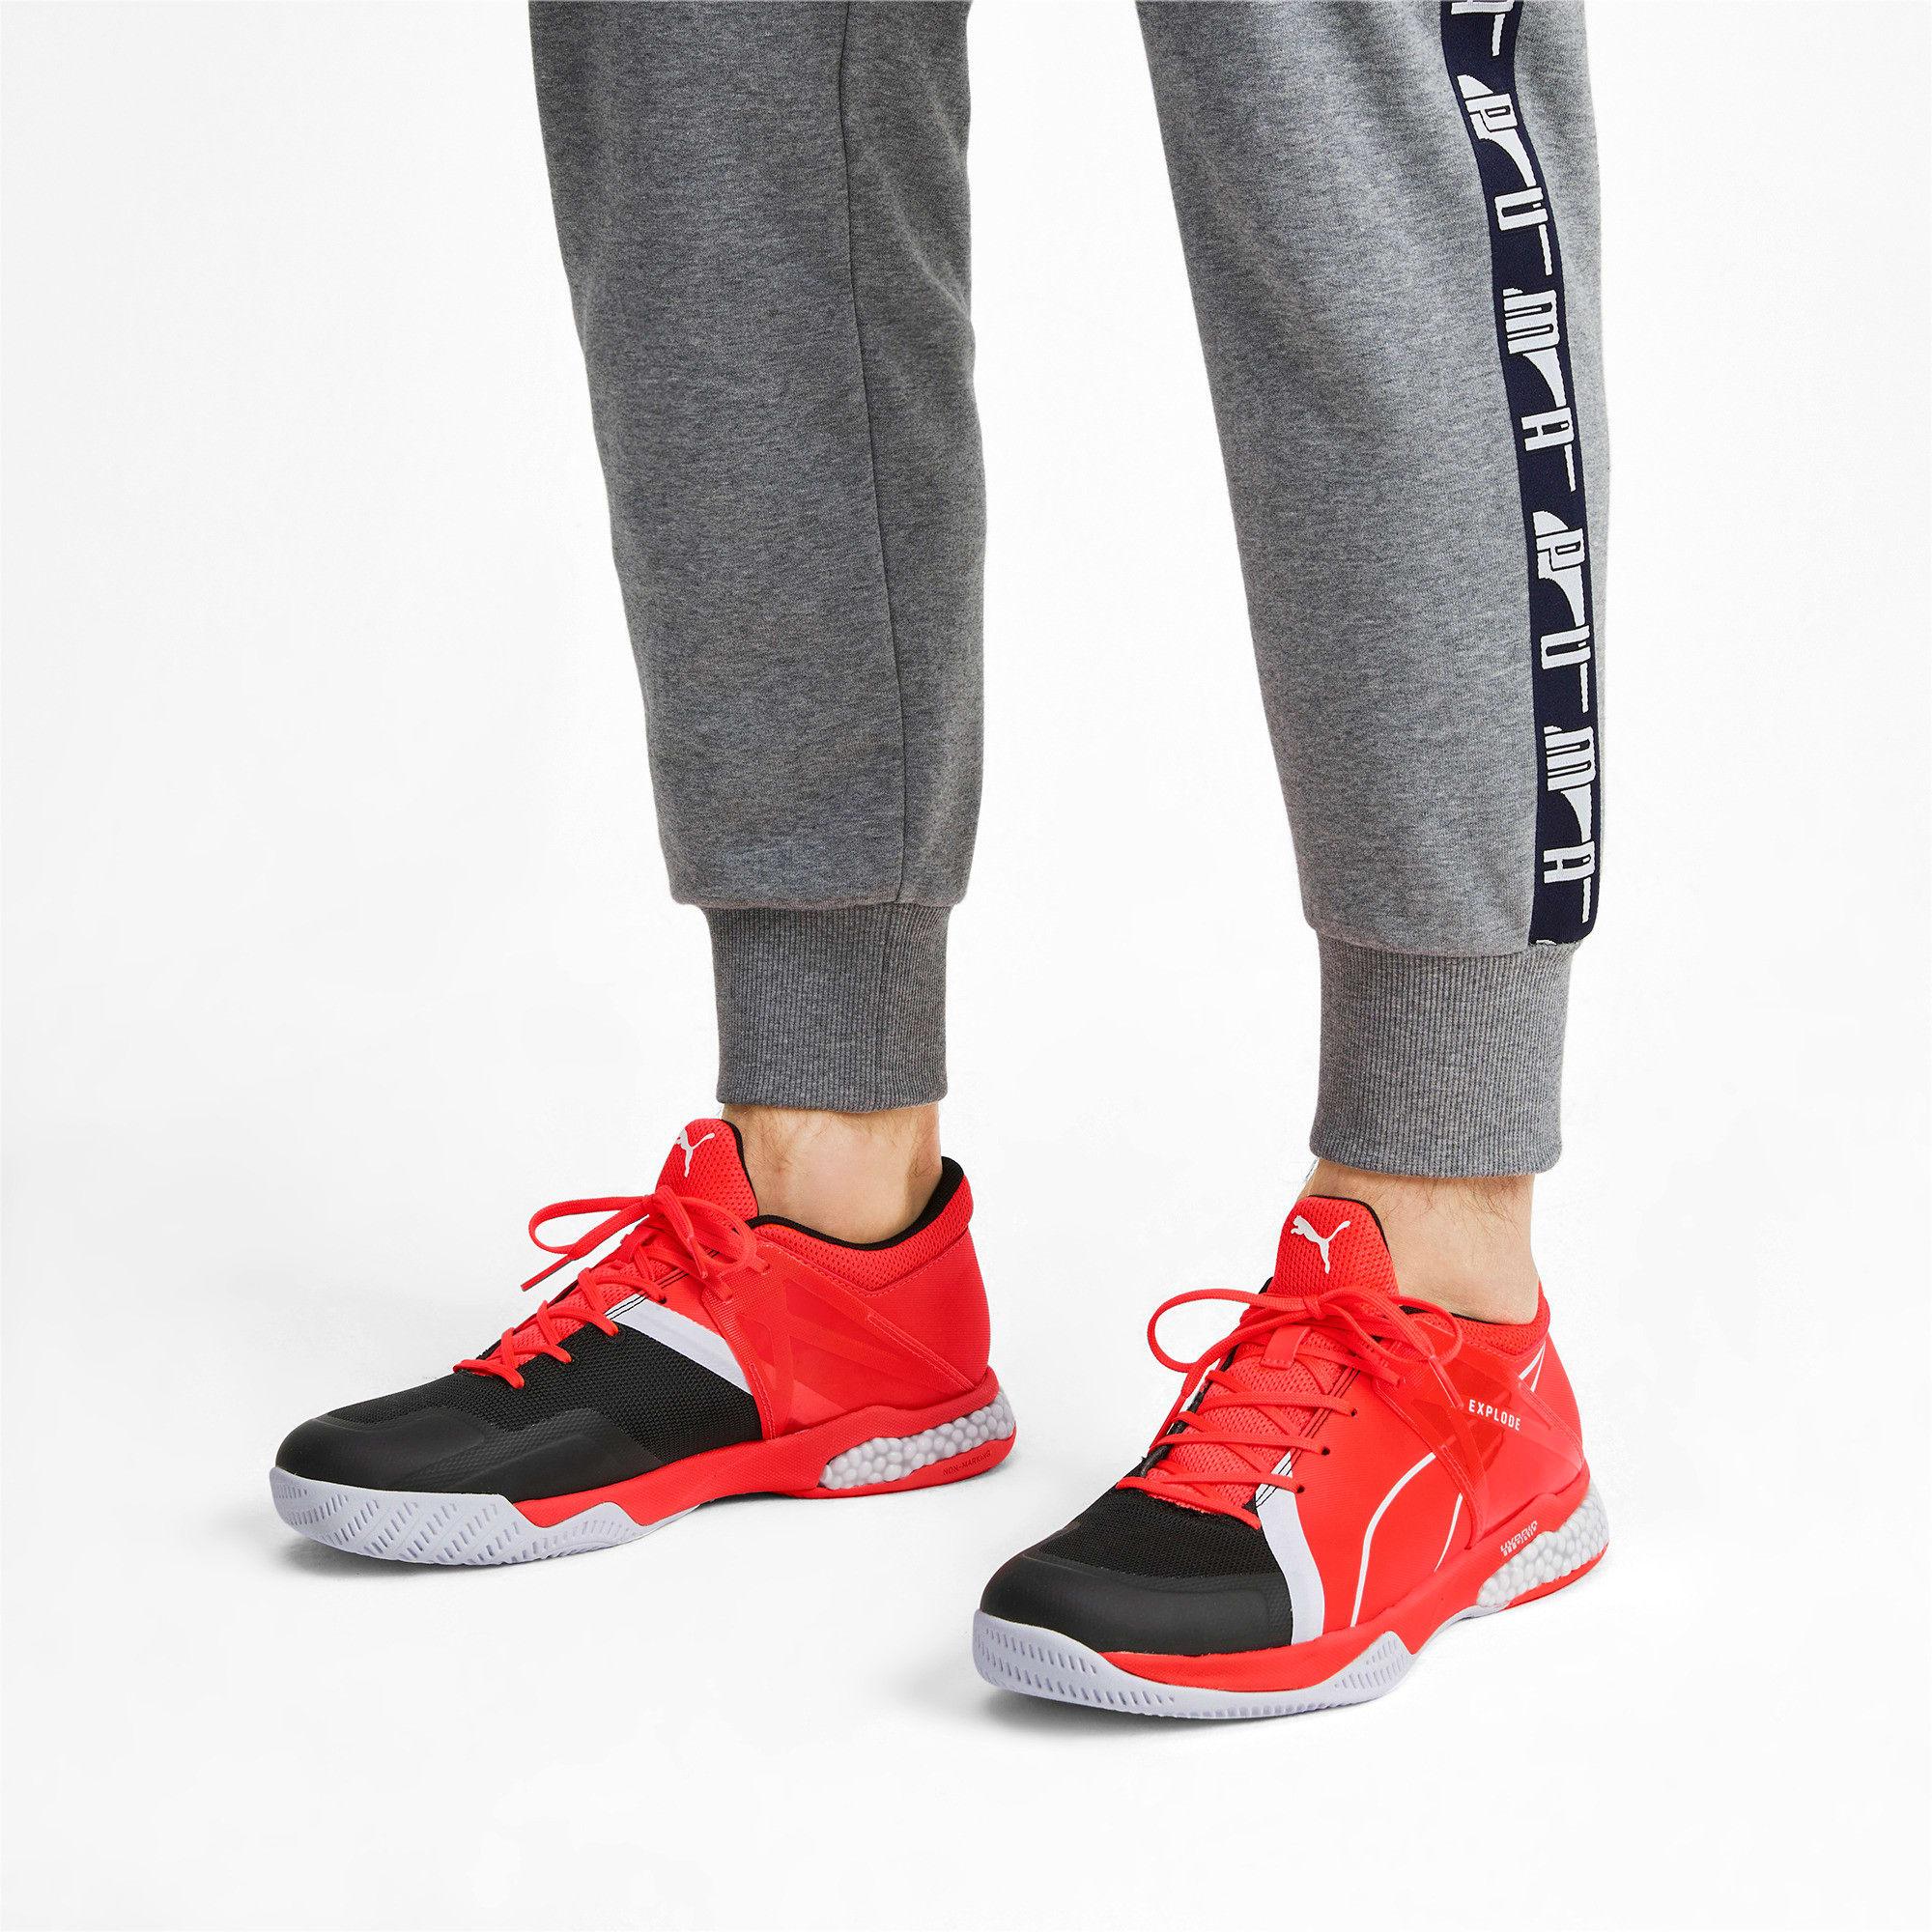 Thumbnail 2 of Chaussures Handball Explode XT Hybrid 2 Training, Black-Puma White-Nrgy Red, medium